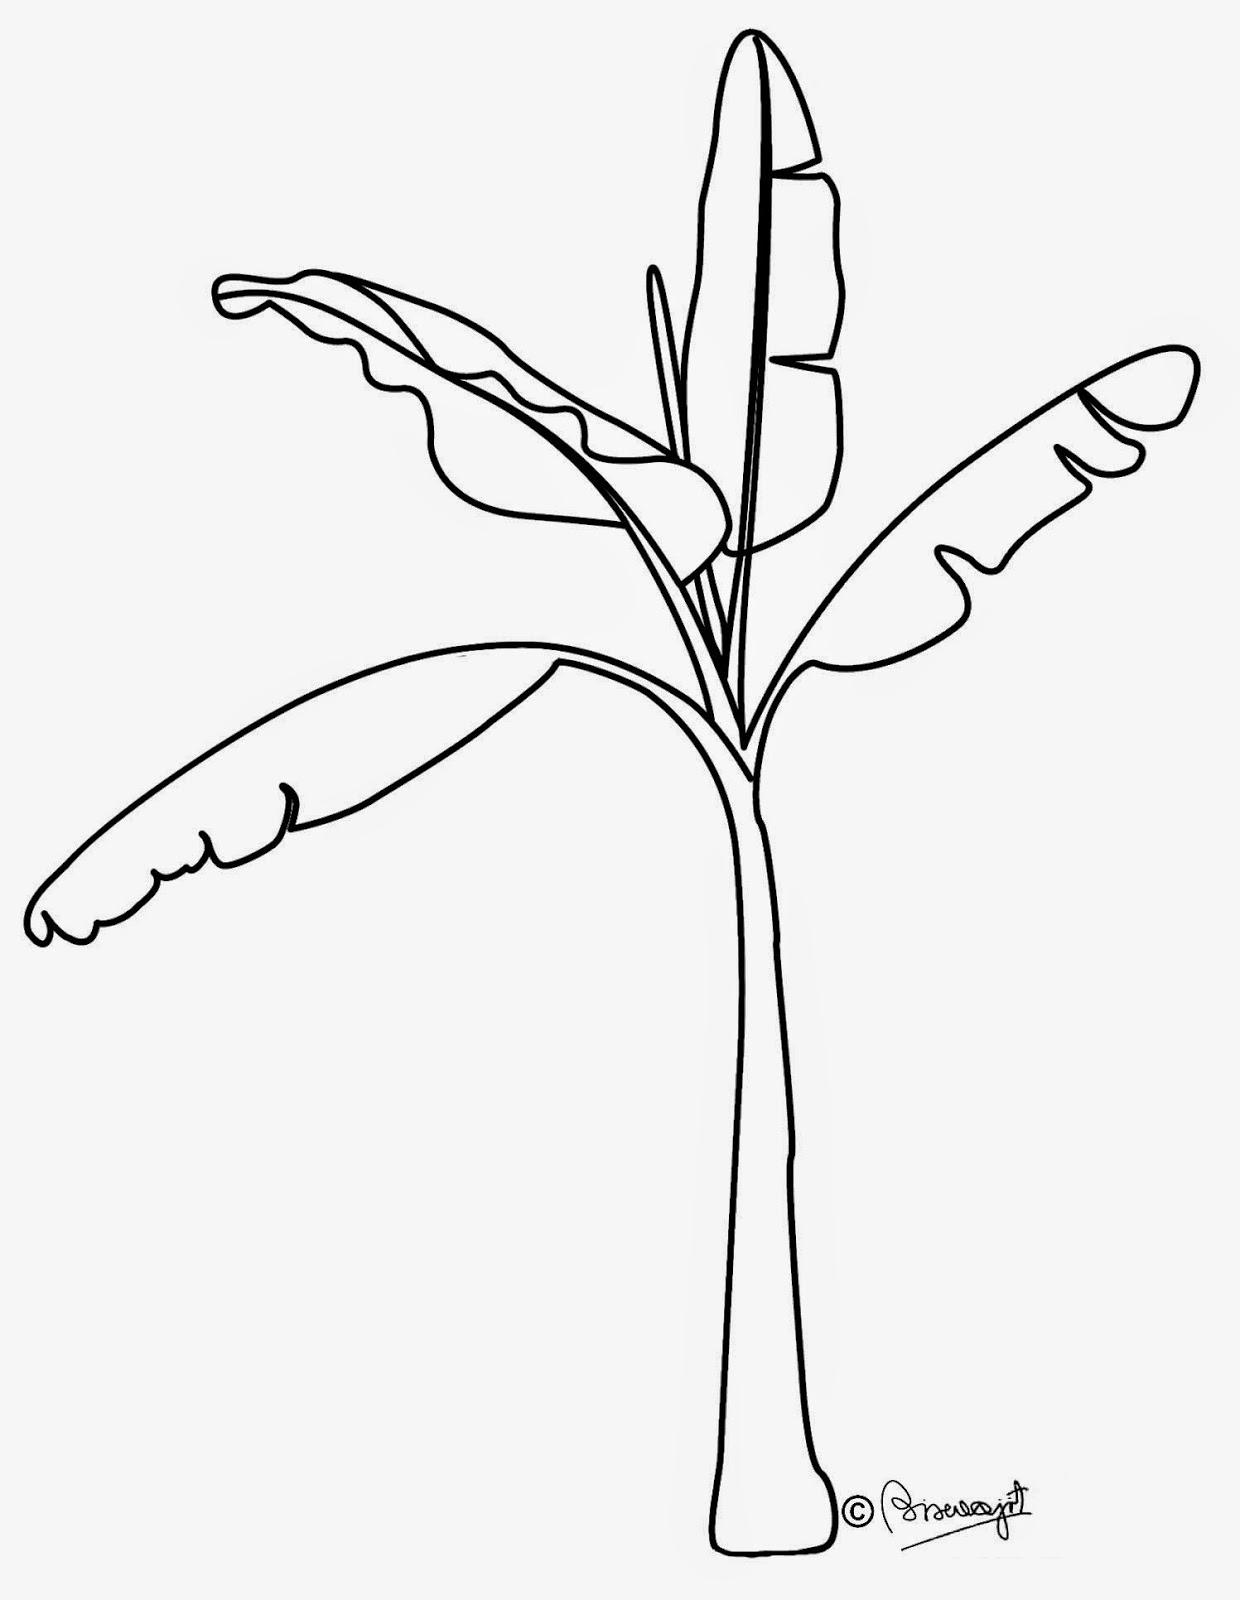 Banana tree clip art black and white.